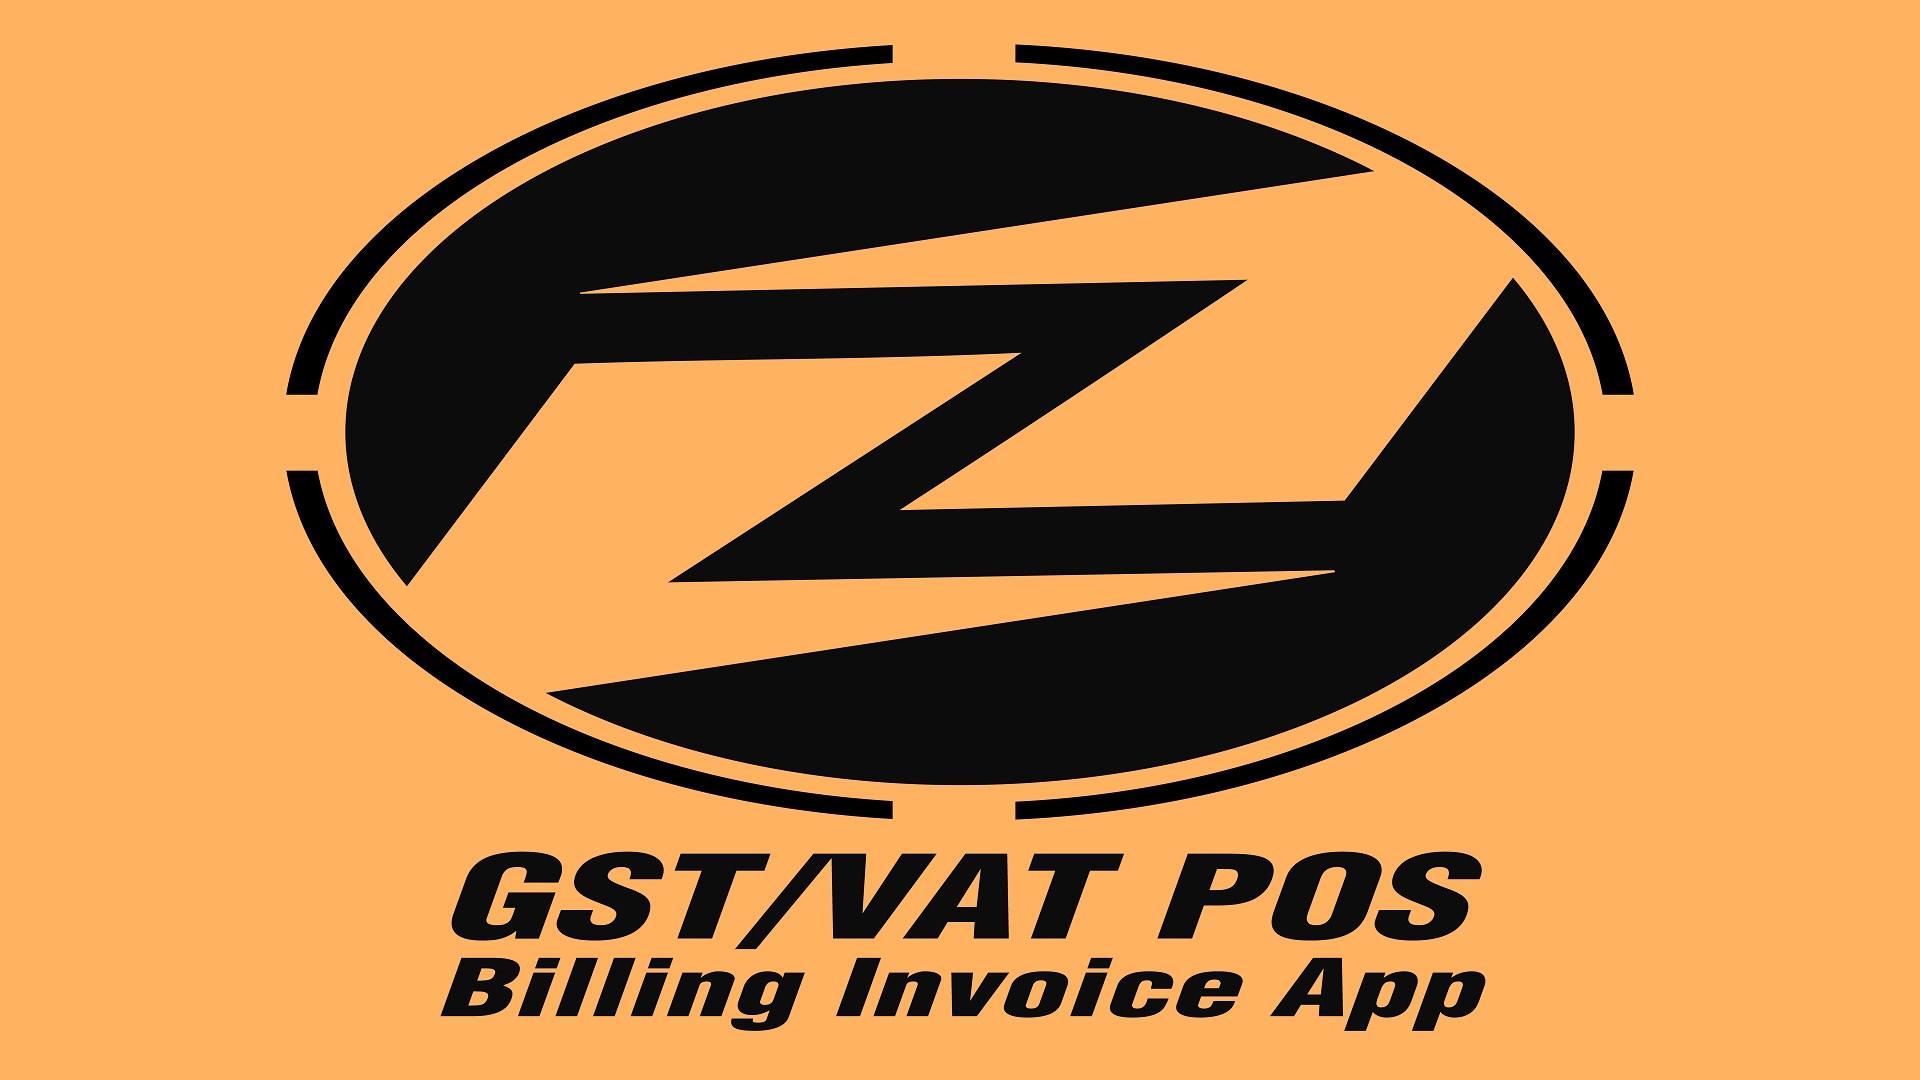 Get GSTVAT POS Billing Invoice App Microsoft Store EnKE - Billing invoice app